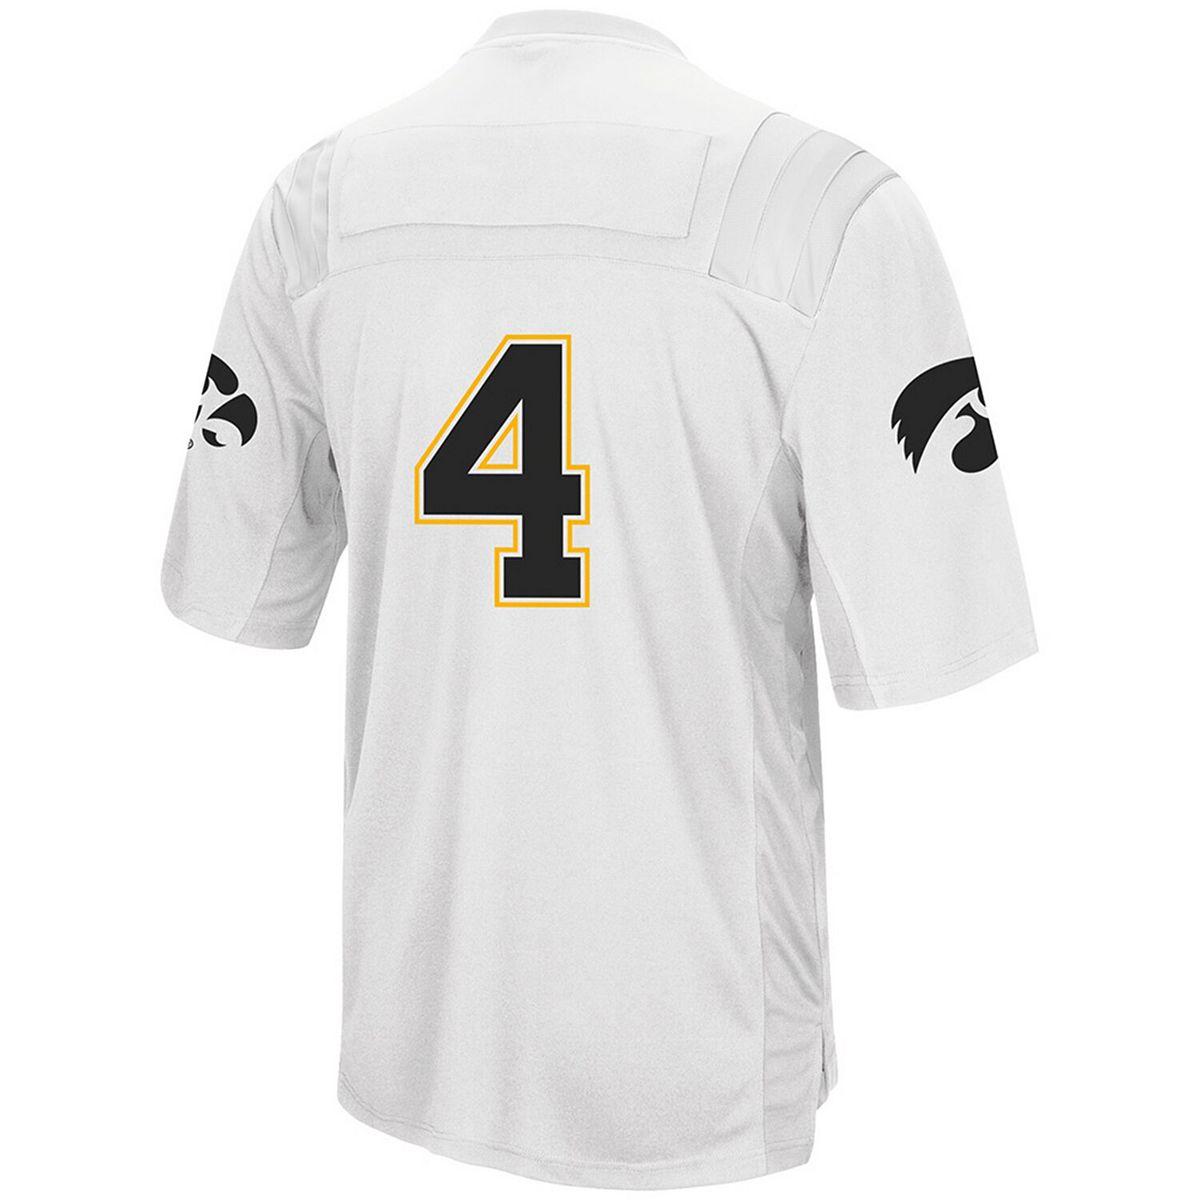 Men's Colosseum White Iowa Hawkeyes Football Jersey foMzP